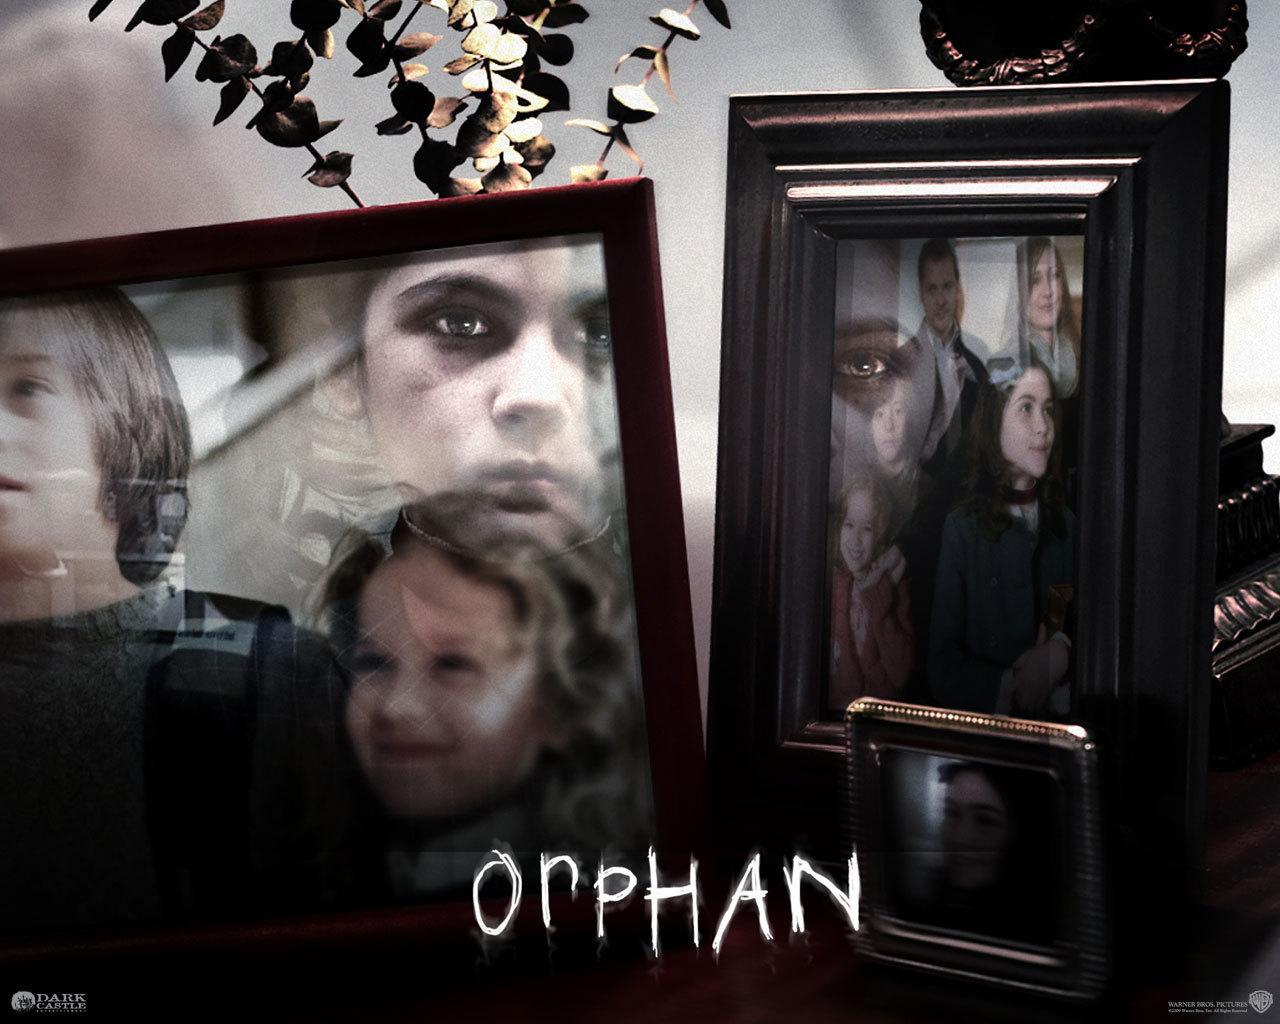 Horrorfilm Orphan